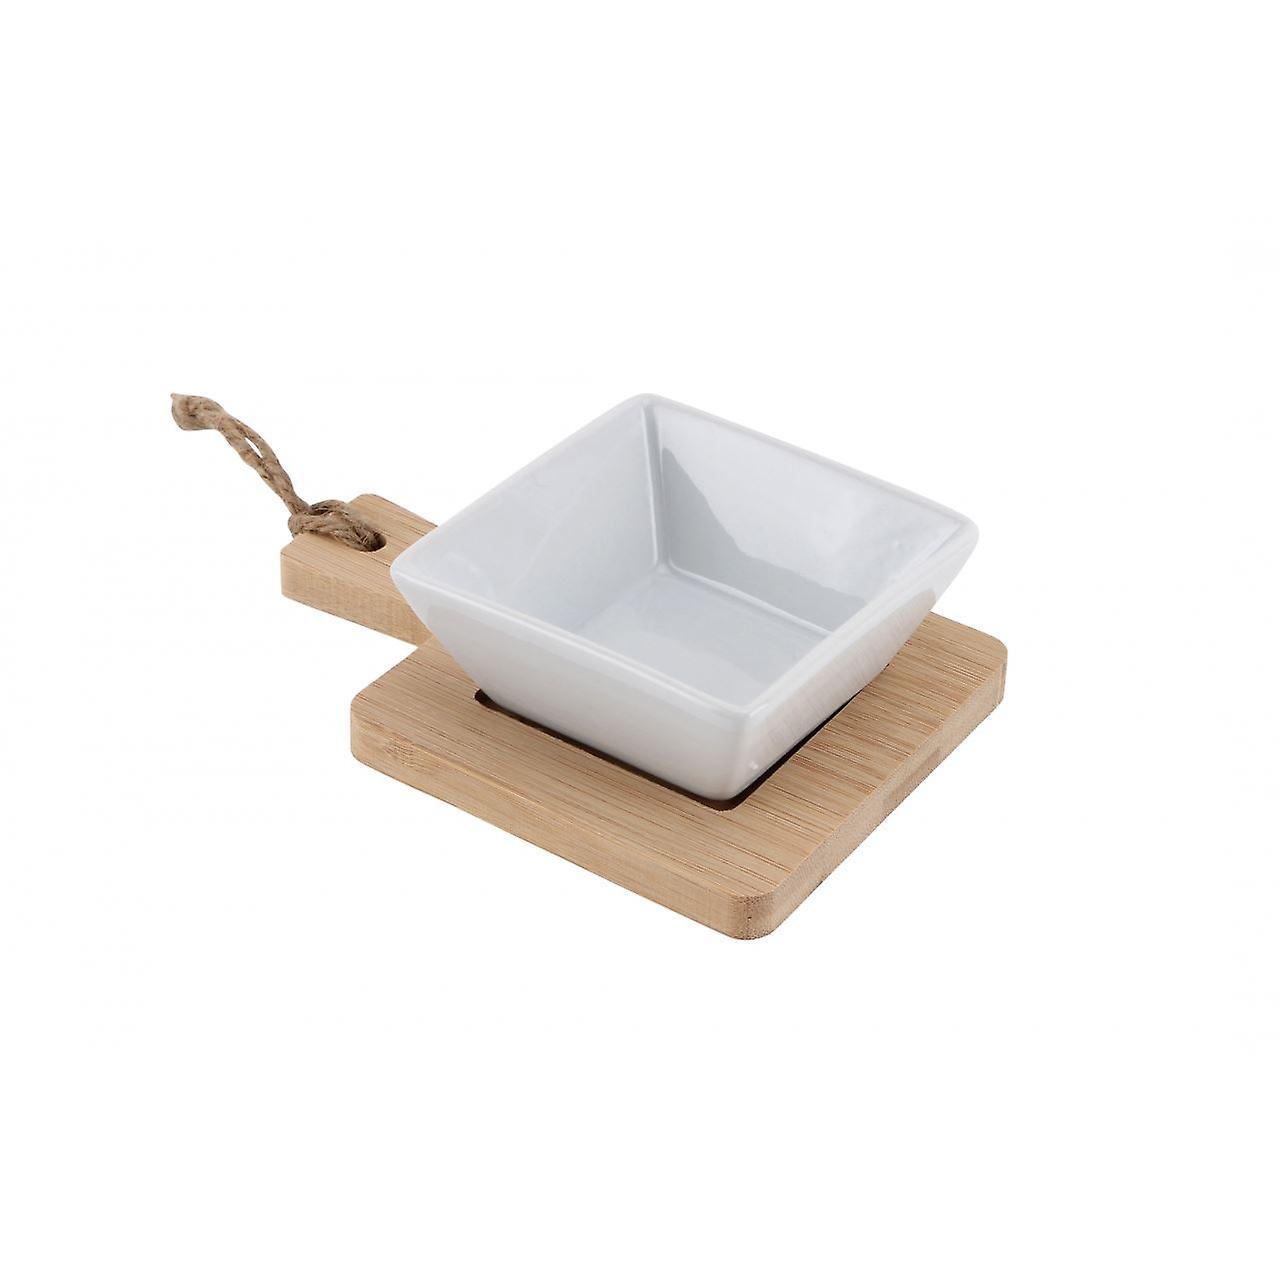 Mini Ceramic Nibble Bowl & Plate